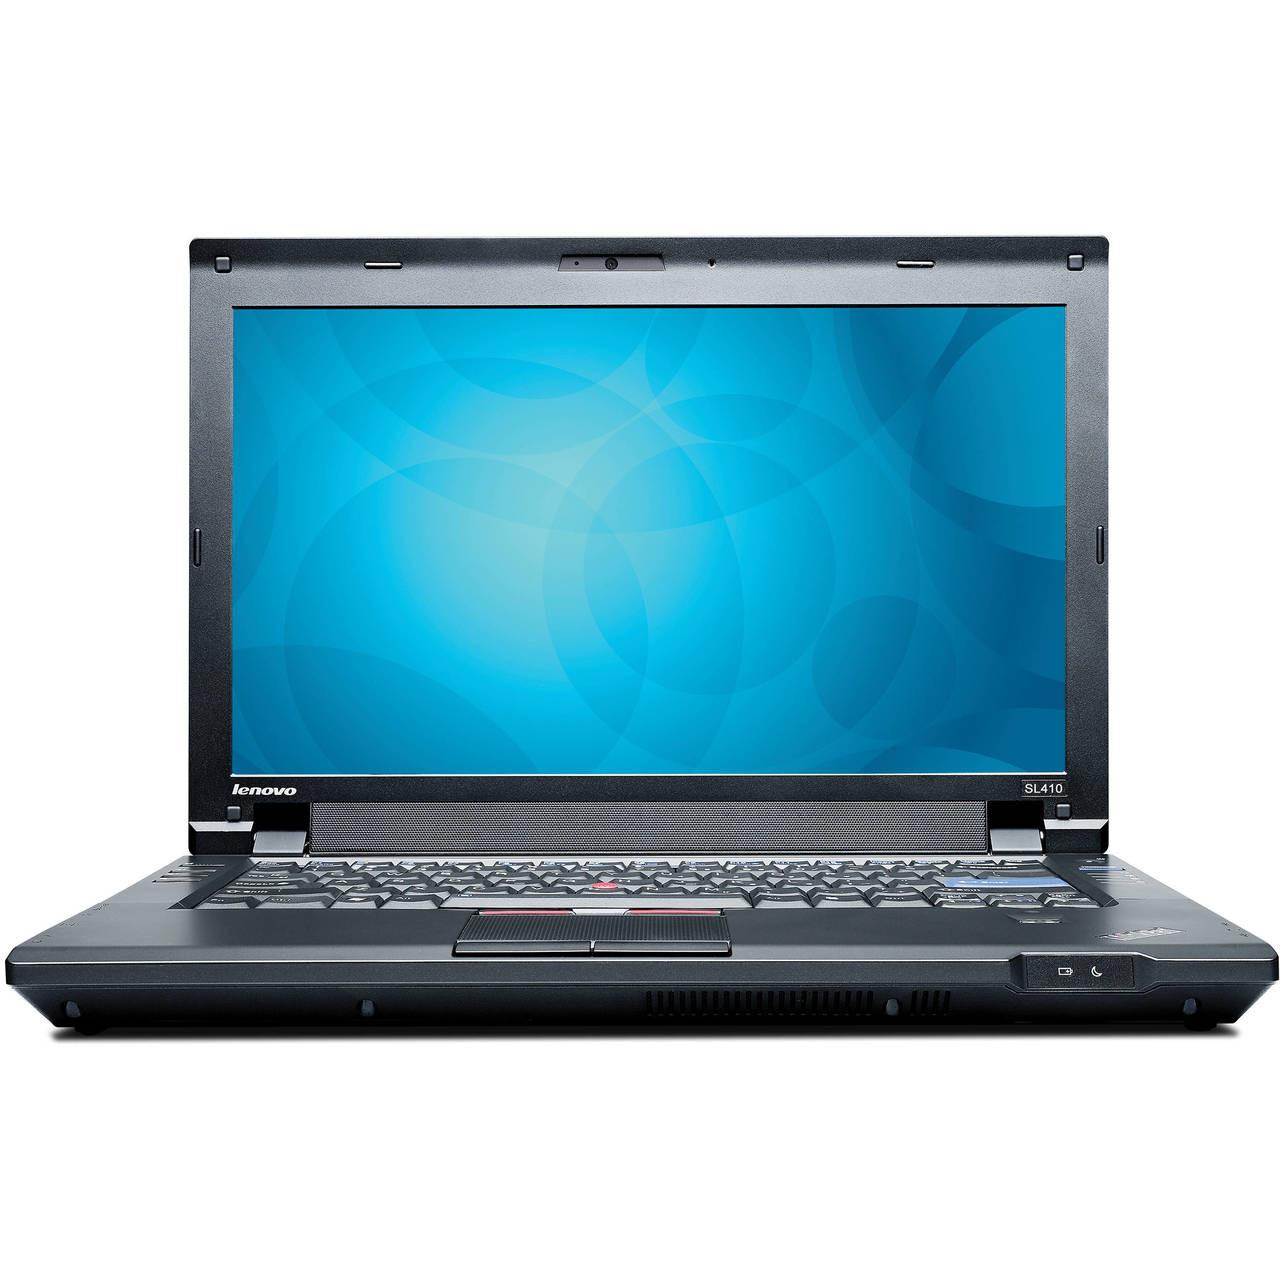 Download Clevo W270HU driver for Windows XP / 7 / 8 / 8 1 / 10